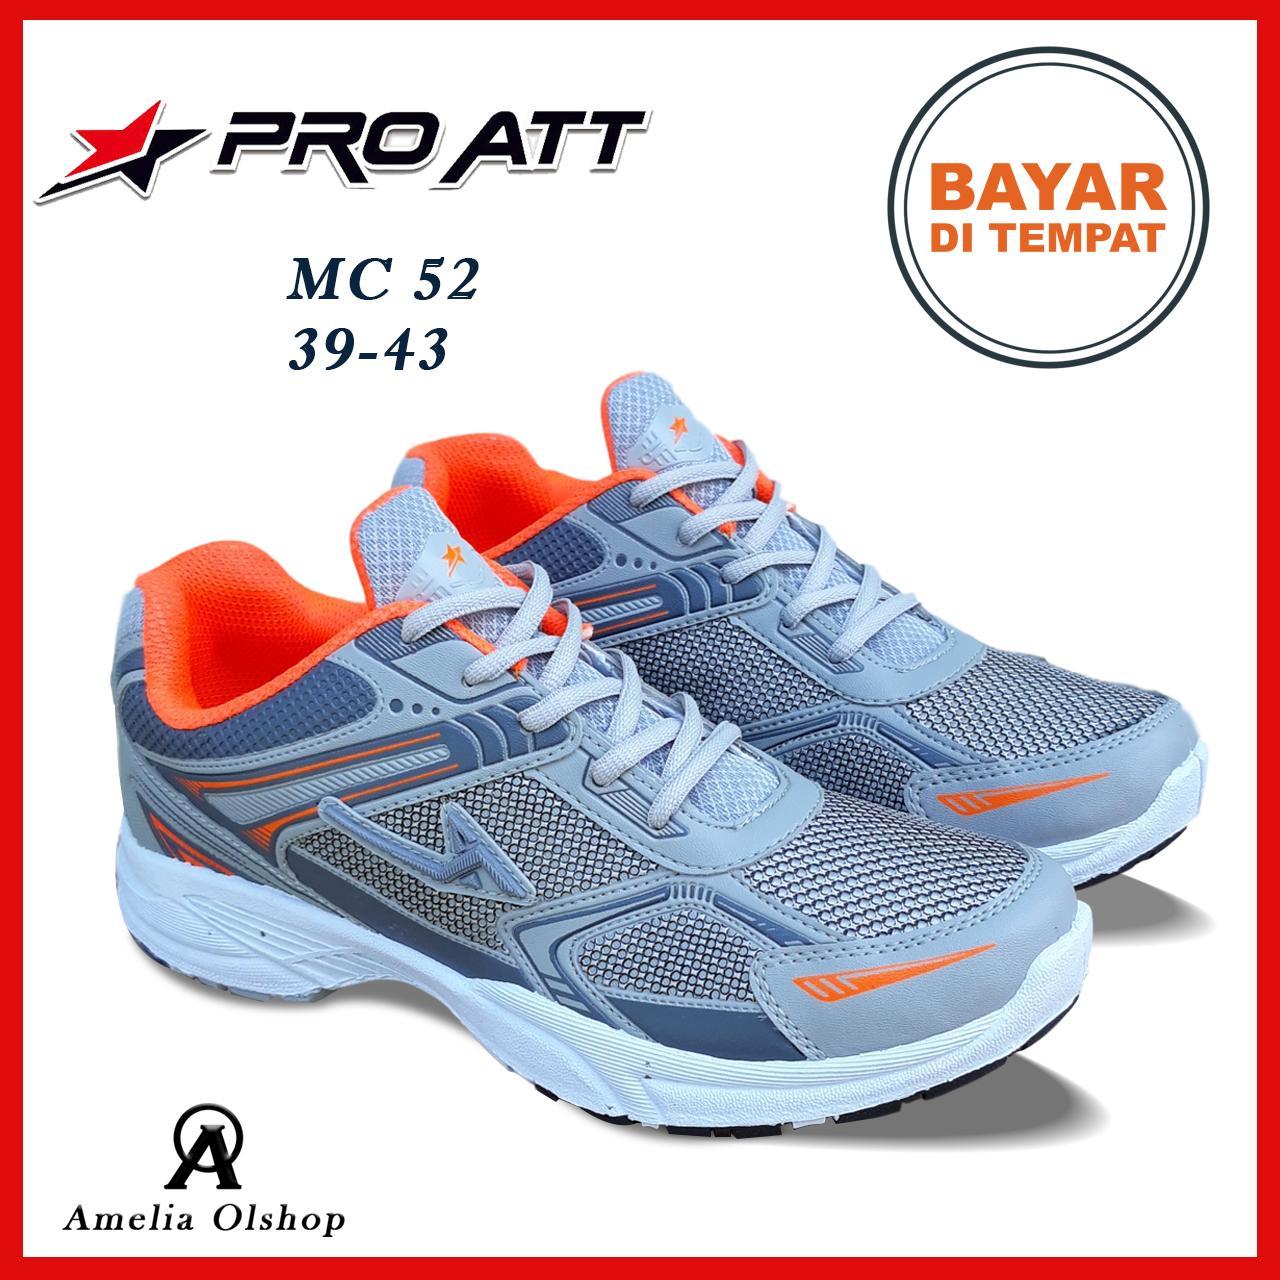 Amelia Olshop - Sepatu Pro ATT MC 52 40-43   Sepatu Olahraga Pria   e234108369